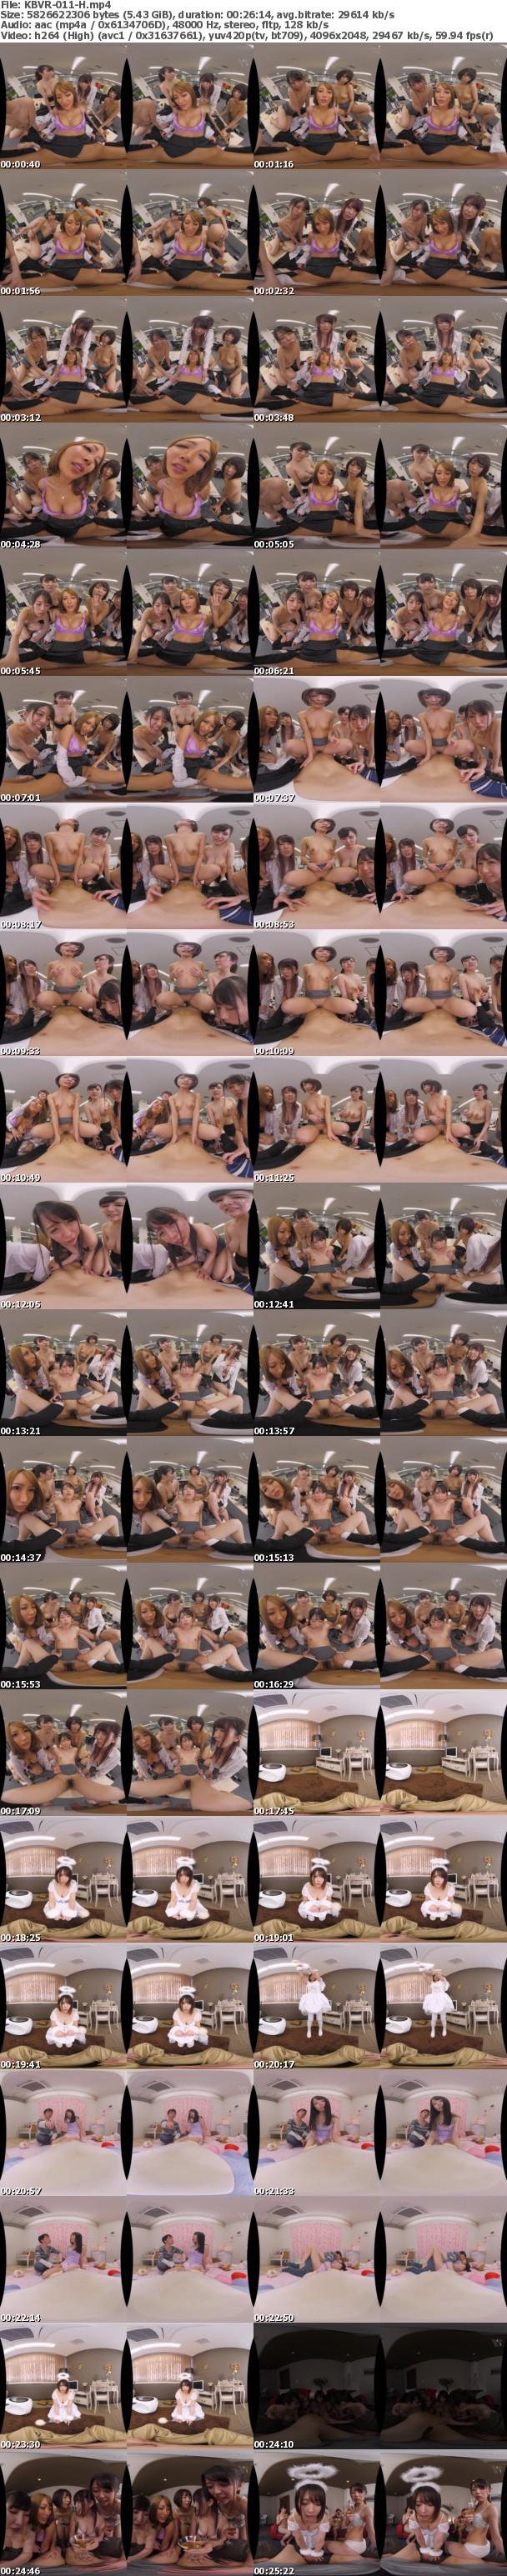 (VR) KBVR-011 ウェルカム新時代!KMPVR史上最大の長尺ストーリー!LIFE!!~とある天使に導かれ…人生丸ごとモテ期になったボクと、10人の美女たち